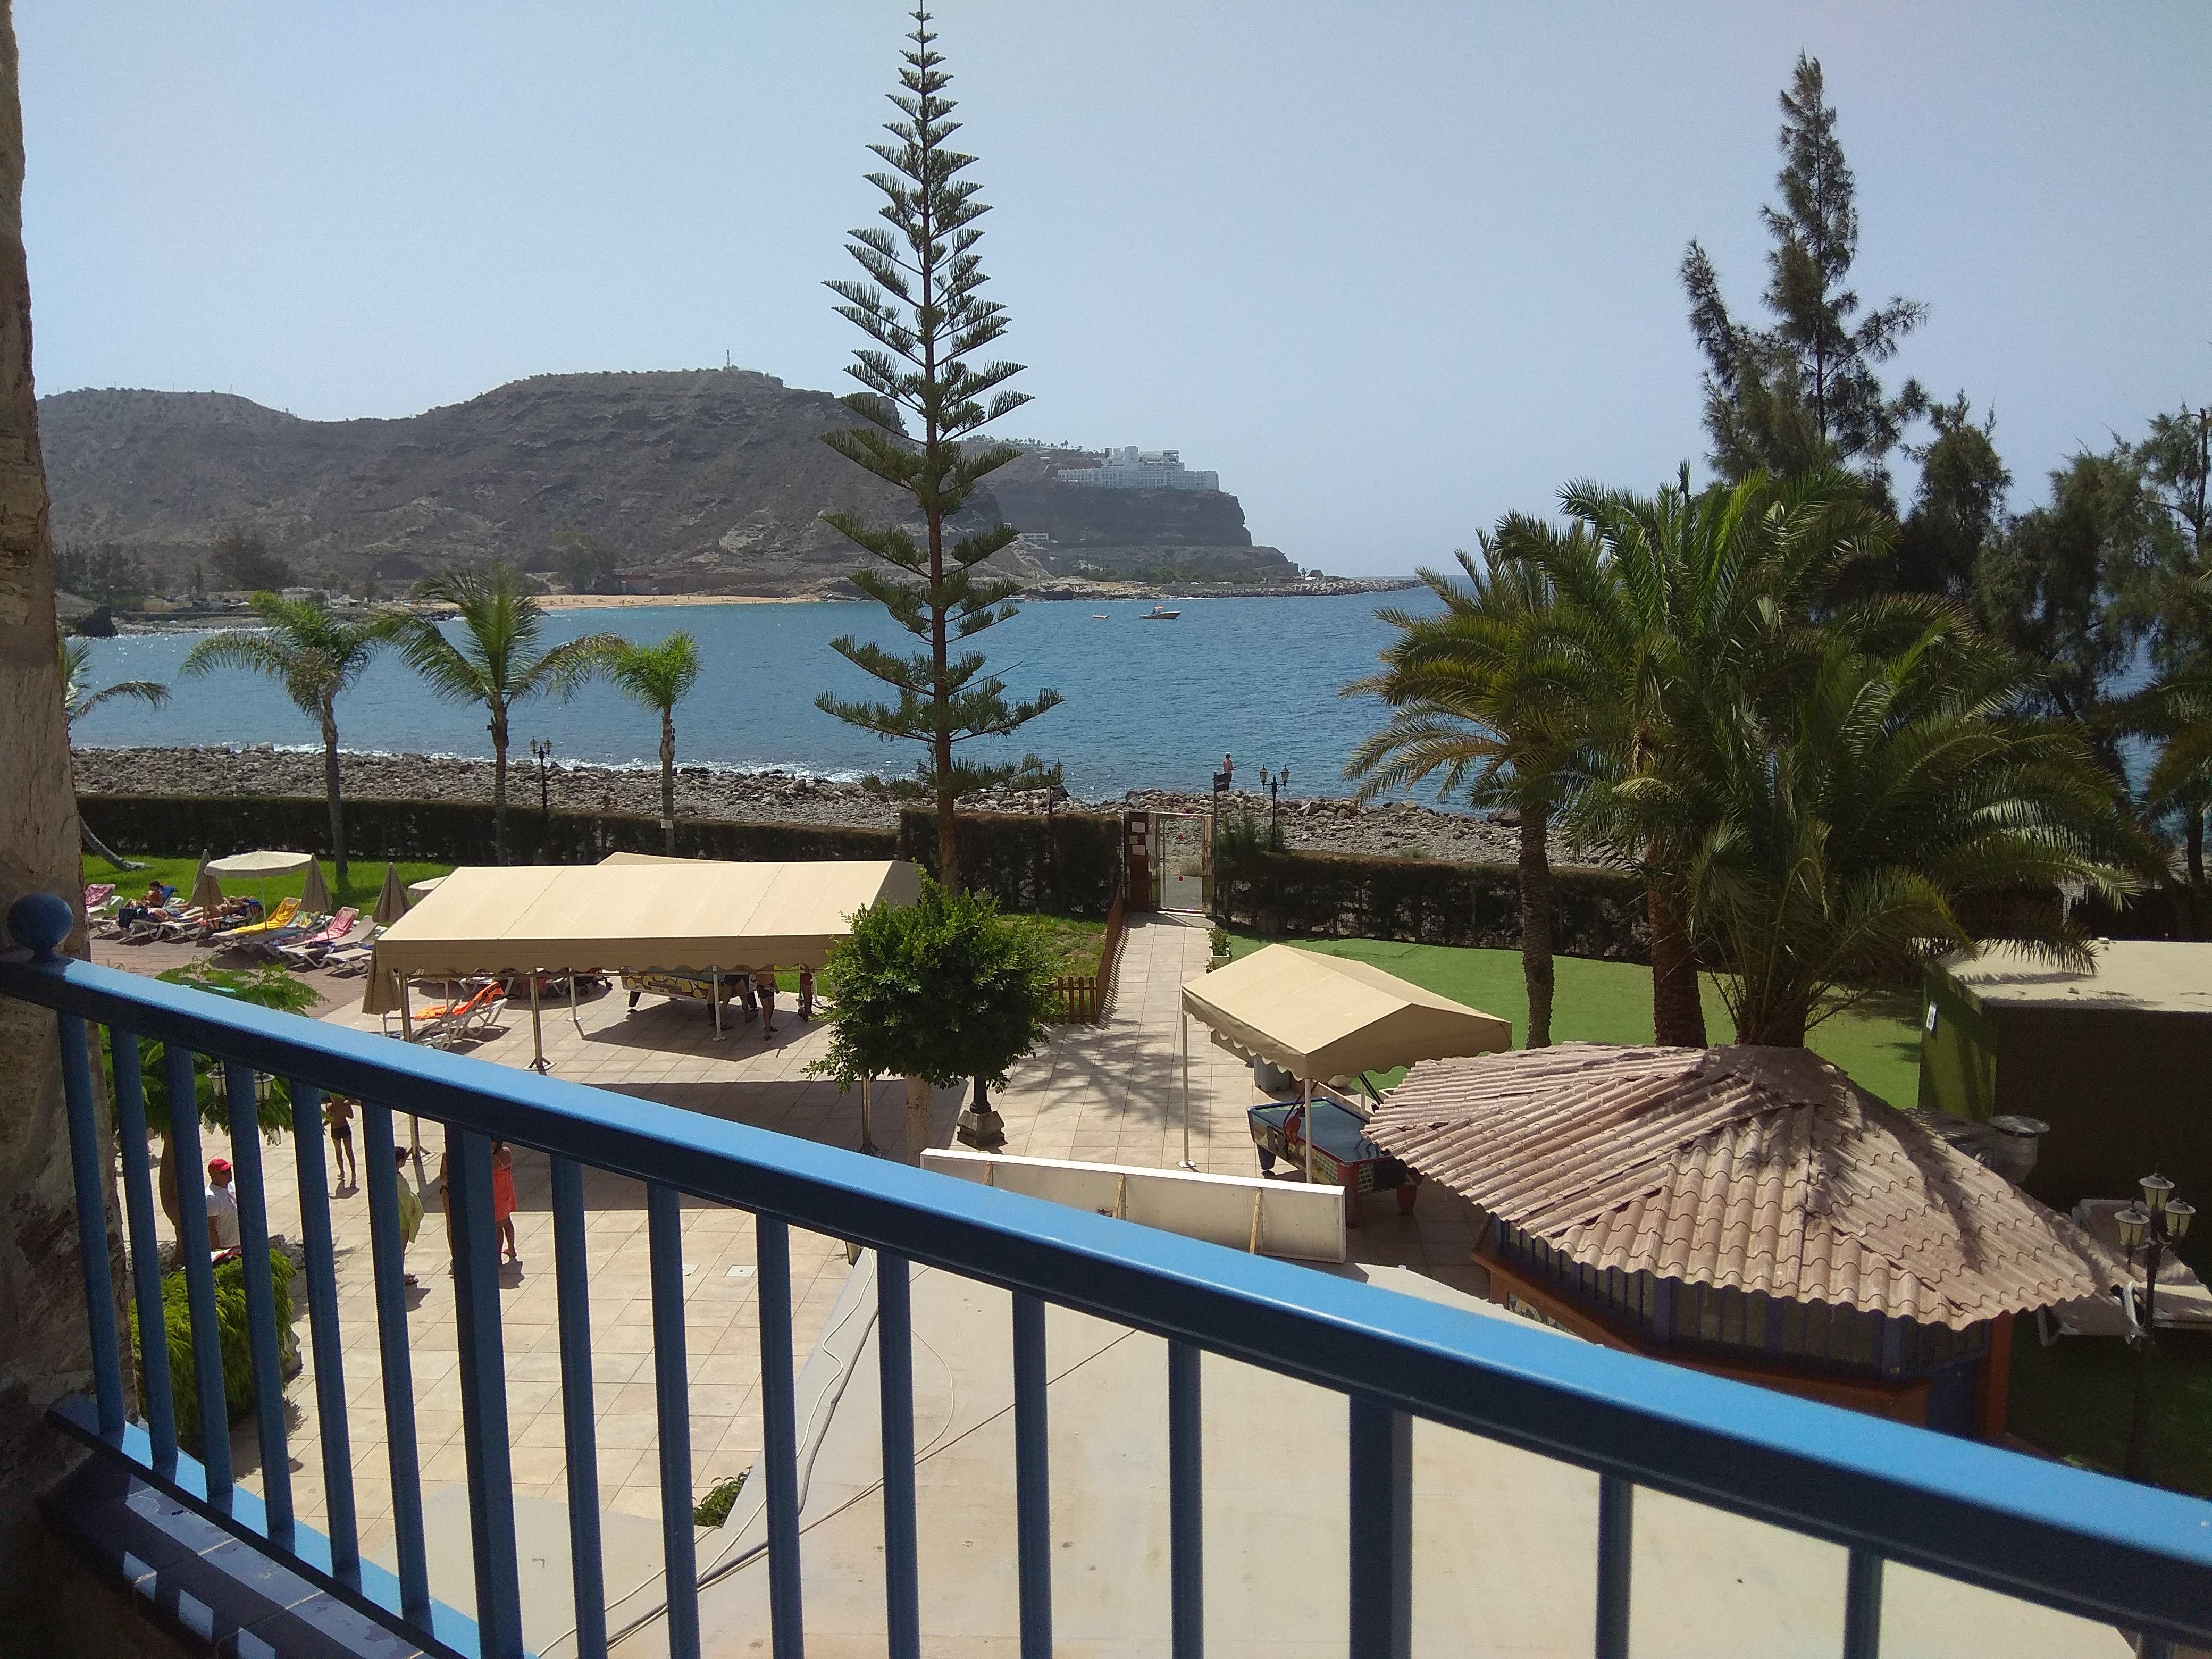 Riviera Marina – Playa del Cura